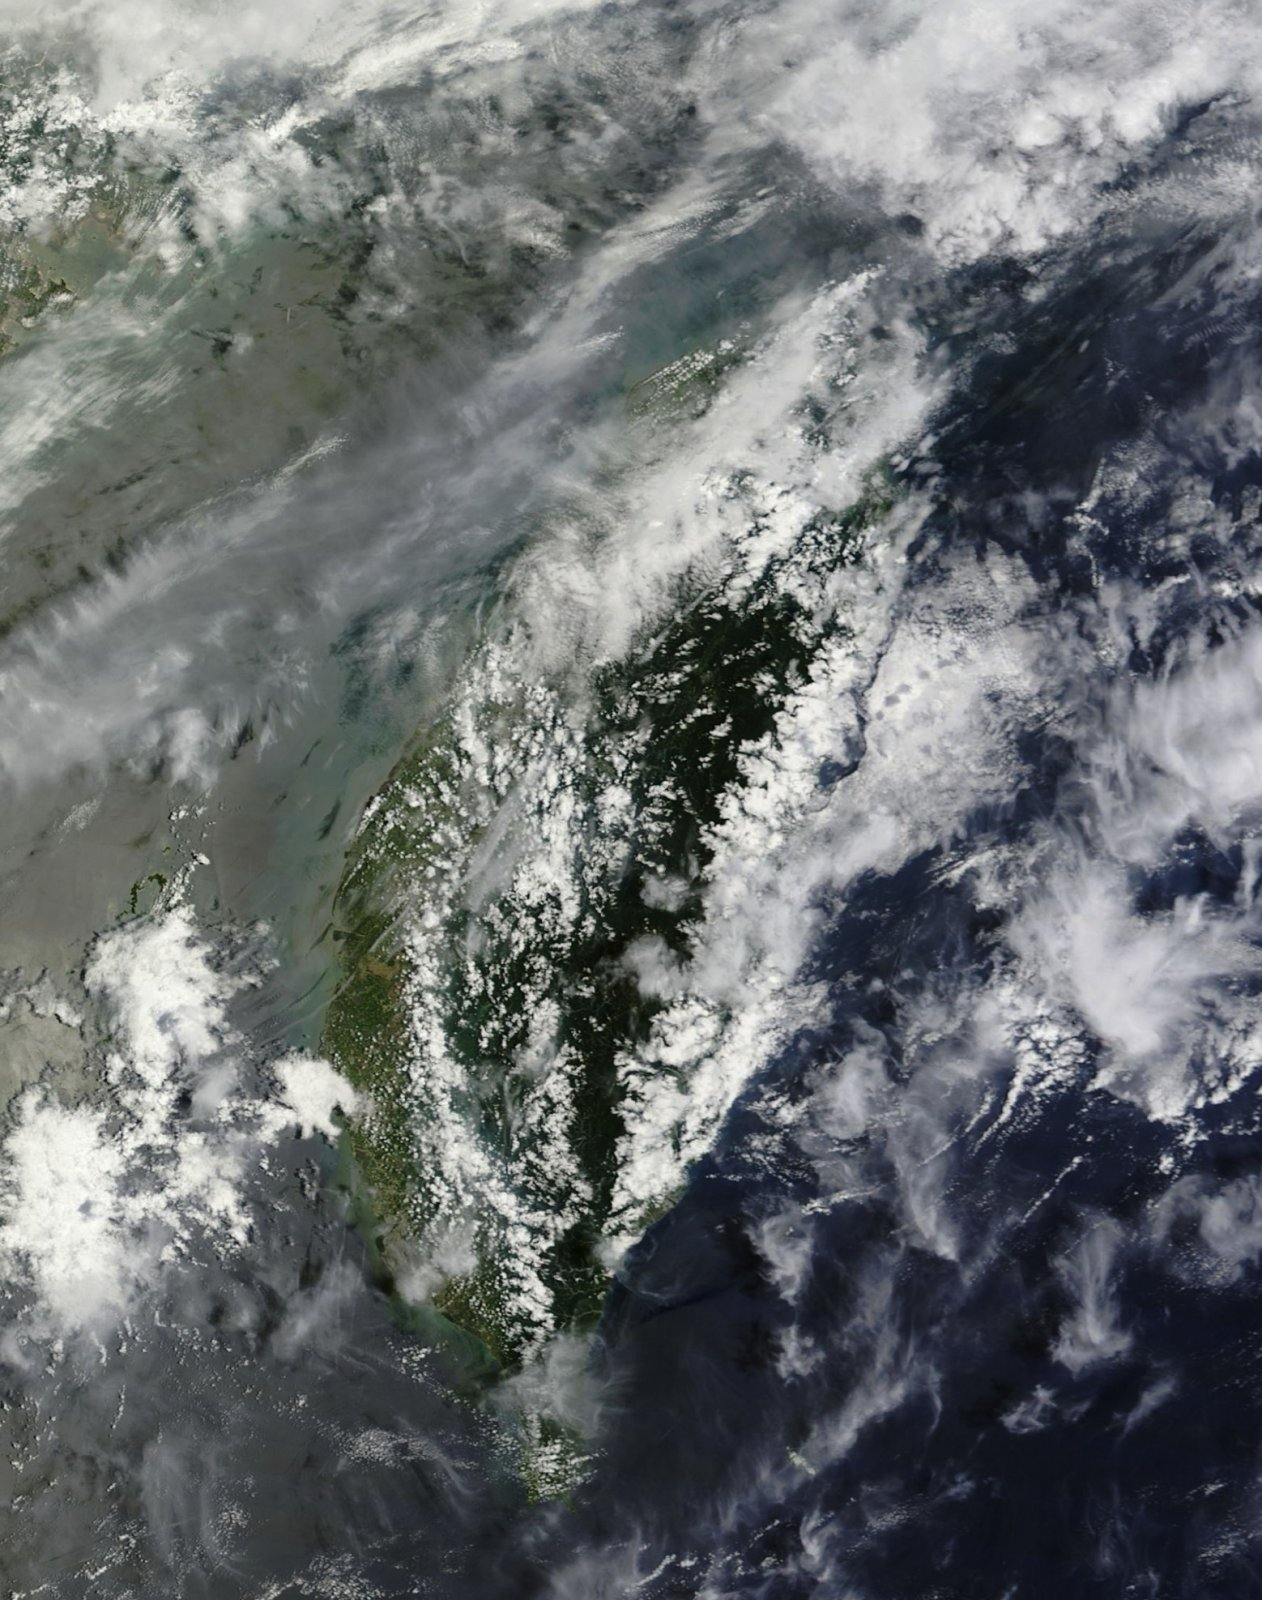 AERONET_NCU_Taiwan.2014170.terra.250m_crop.jpg